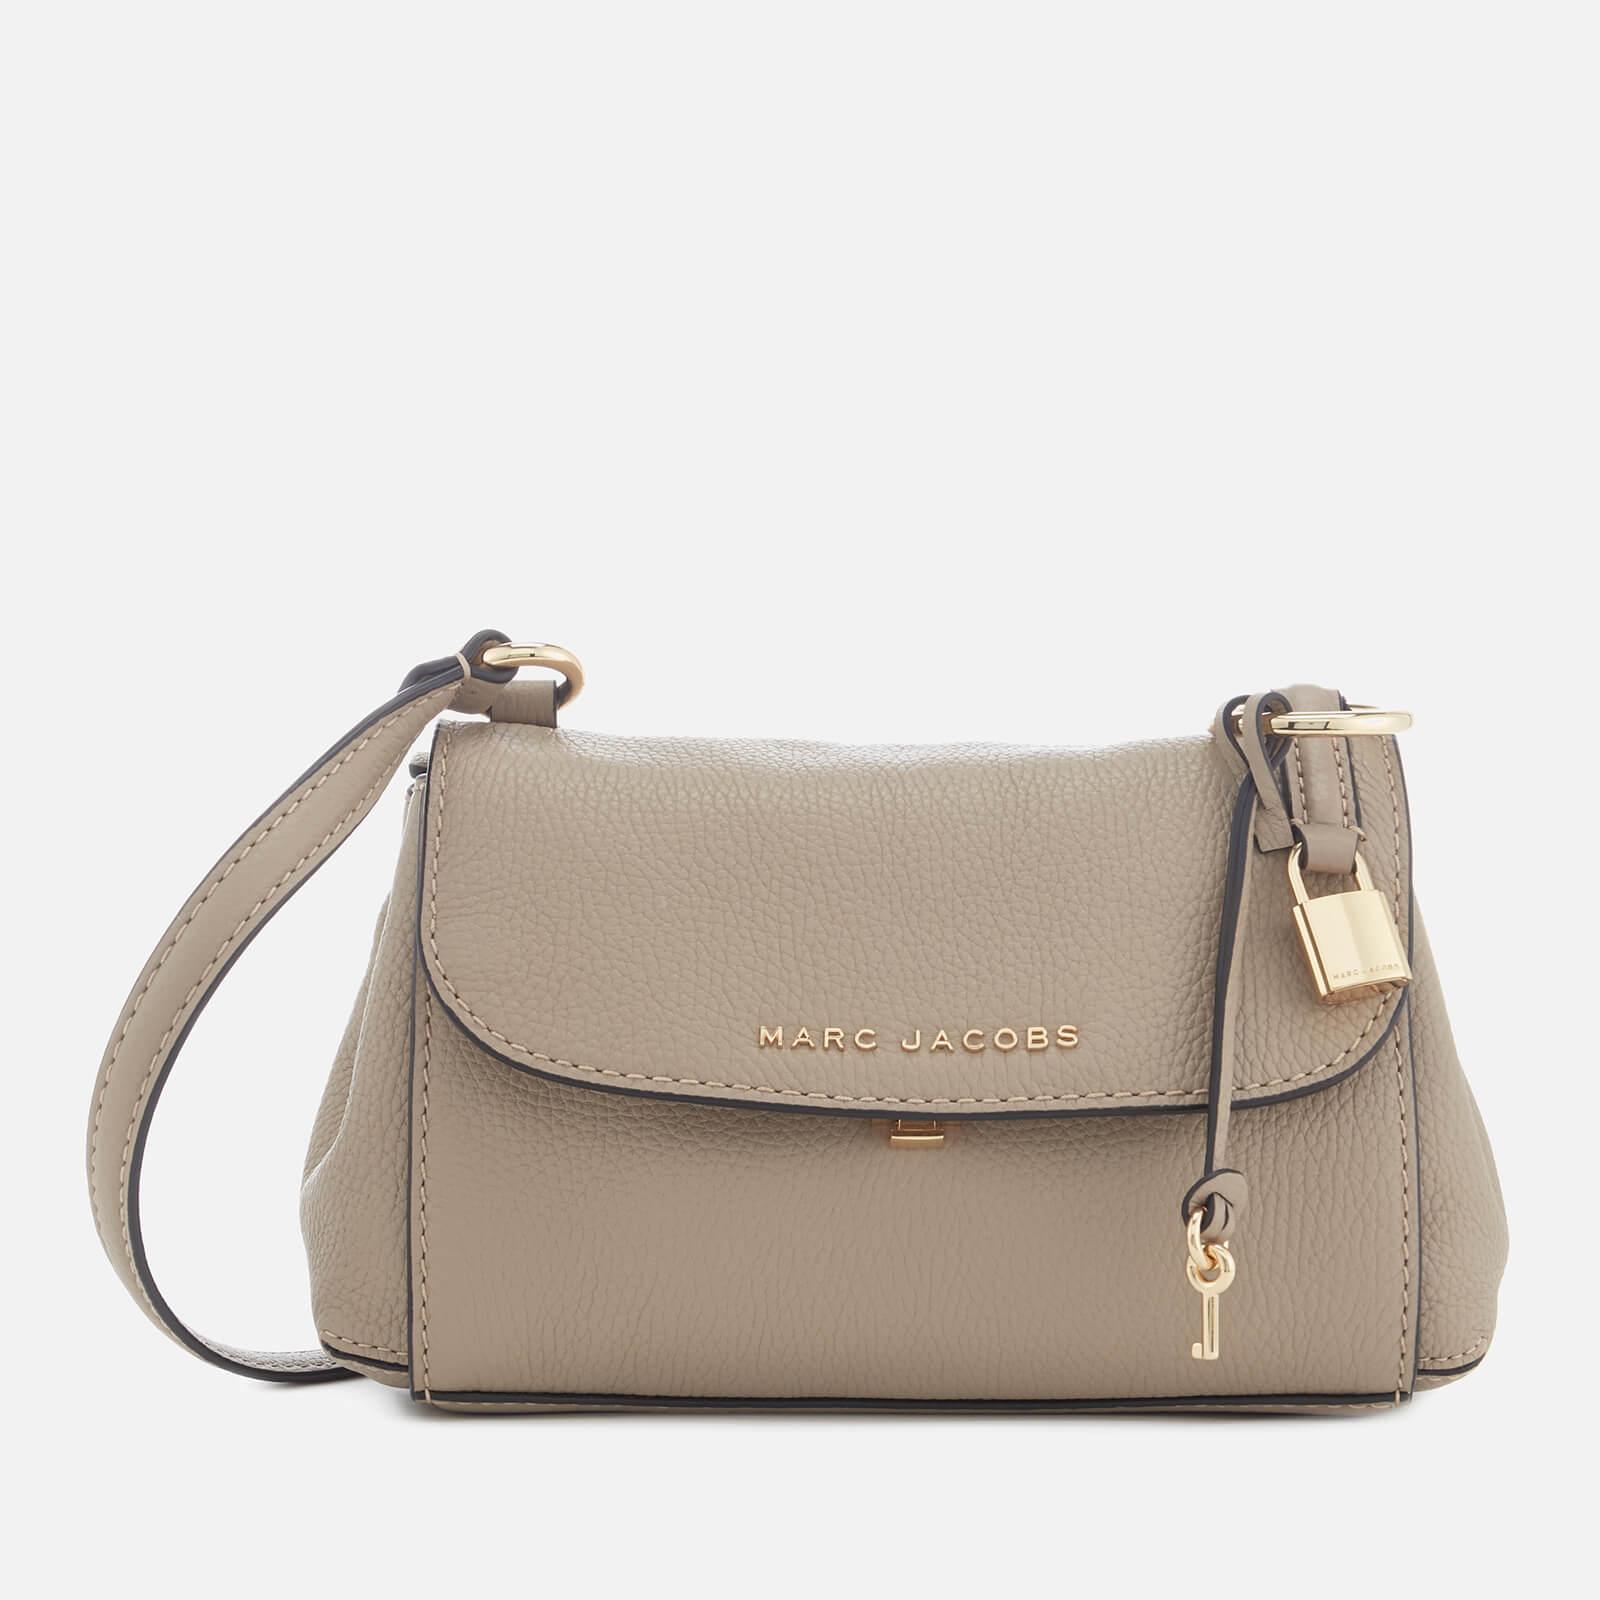 d709de31ceb4 Marc Jacobs Women s Mini Boho Grind Bag - Light Slate - Free UK ...